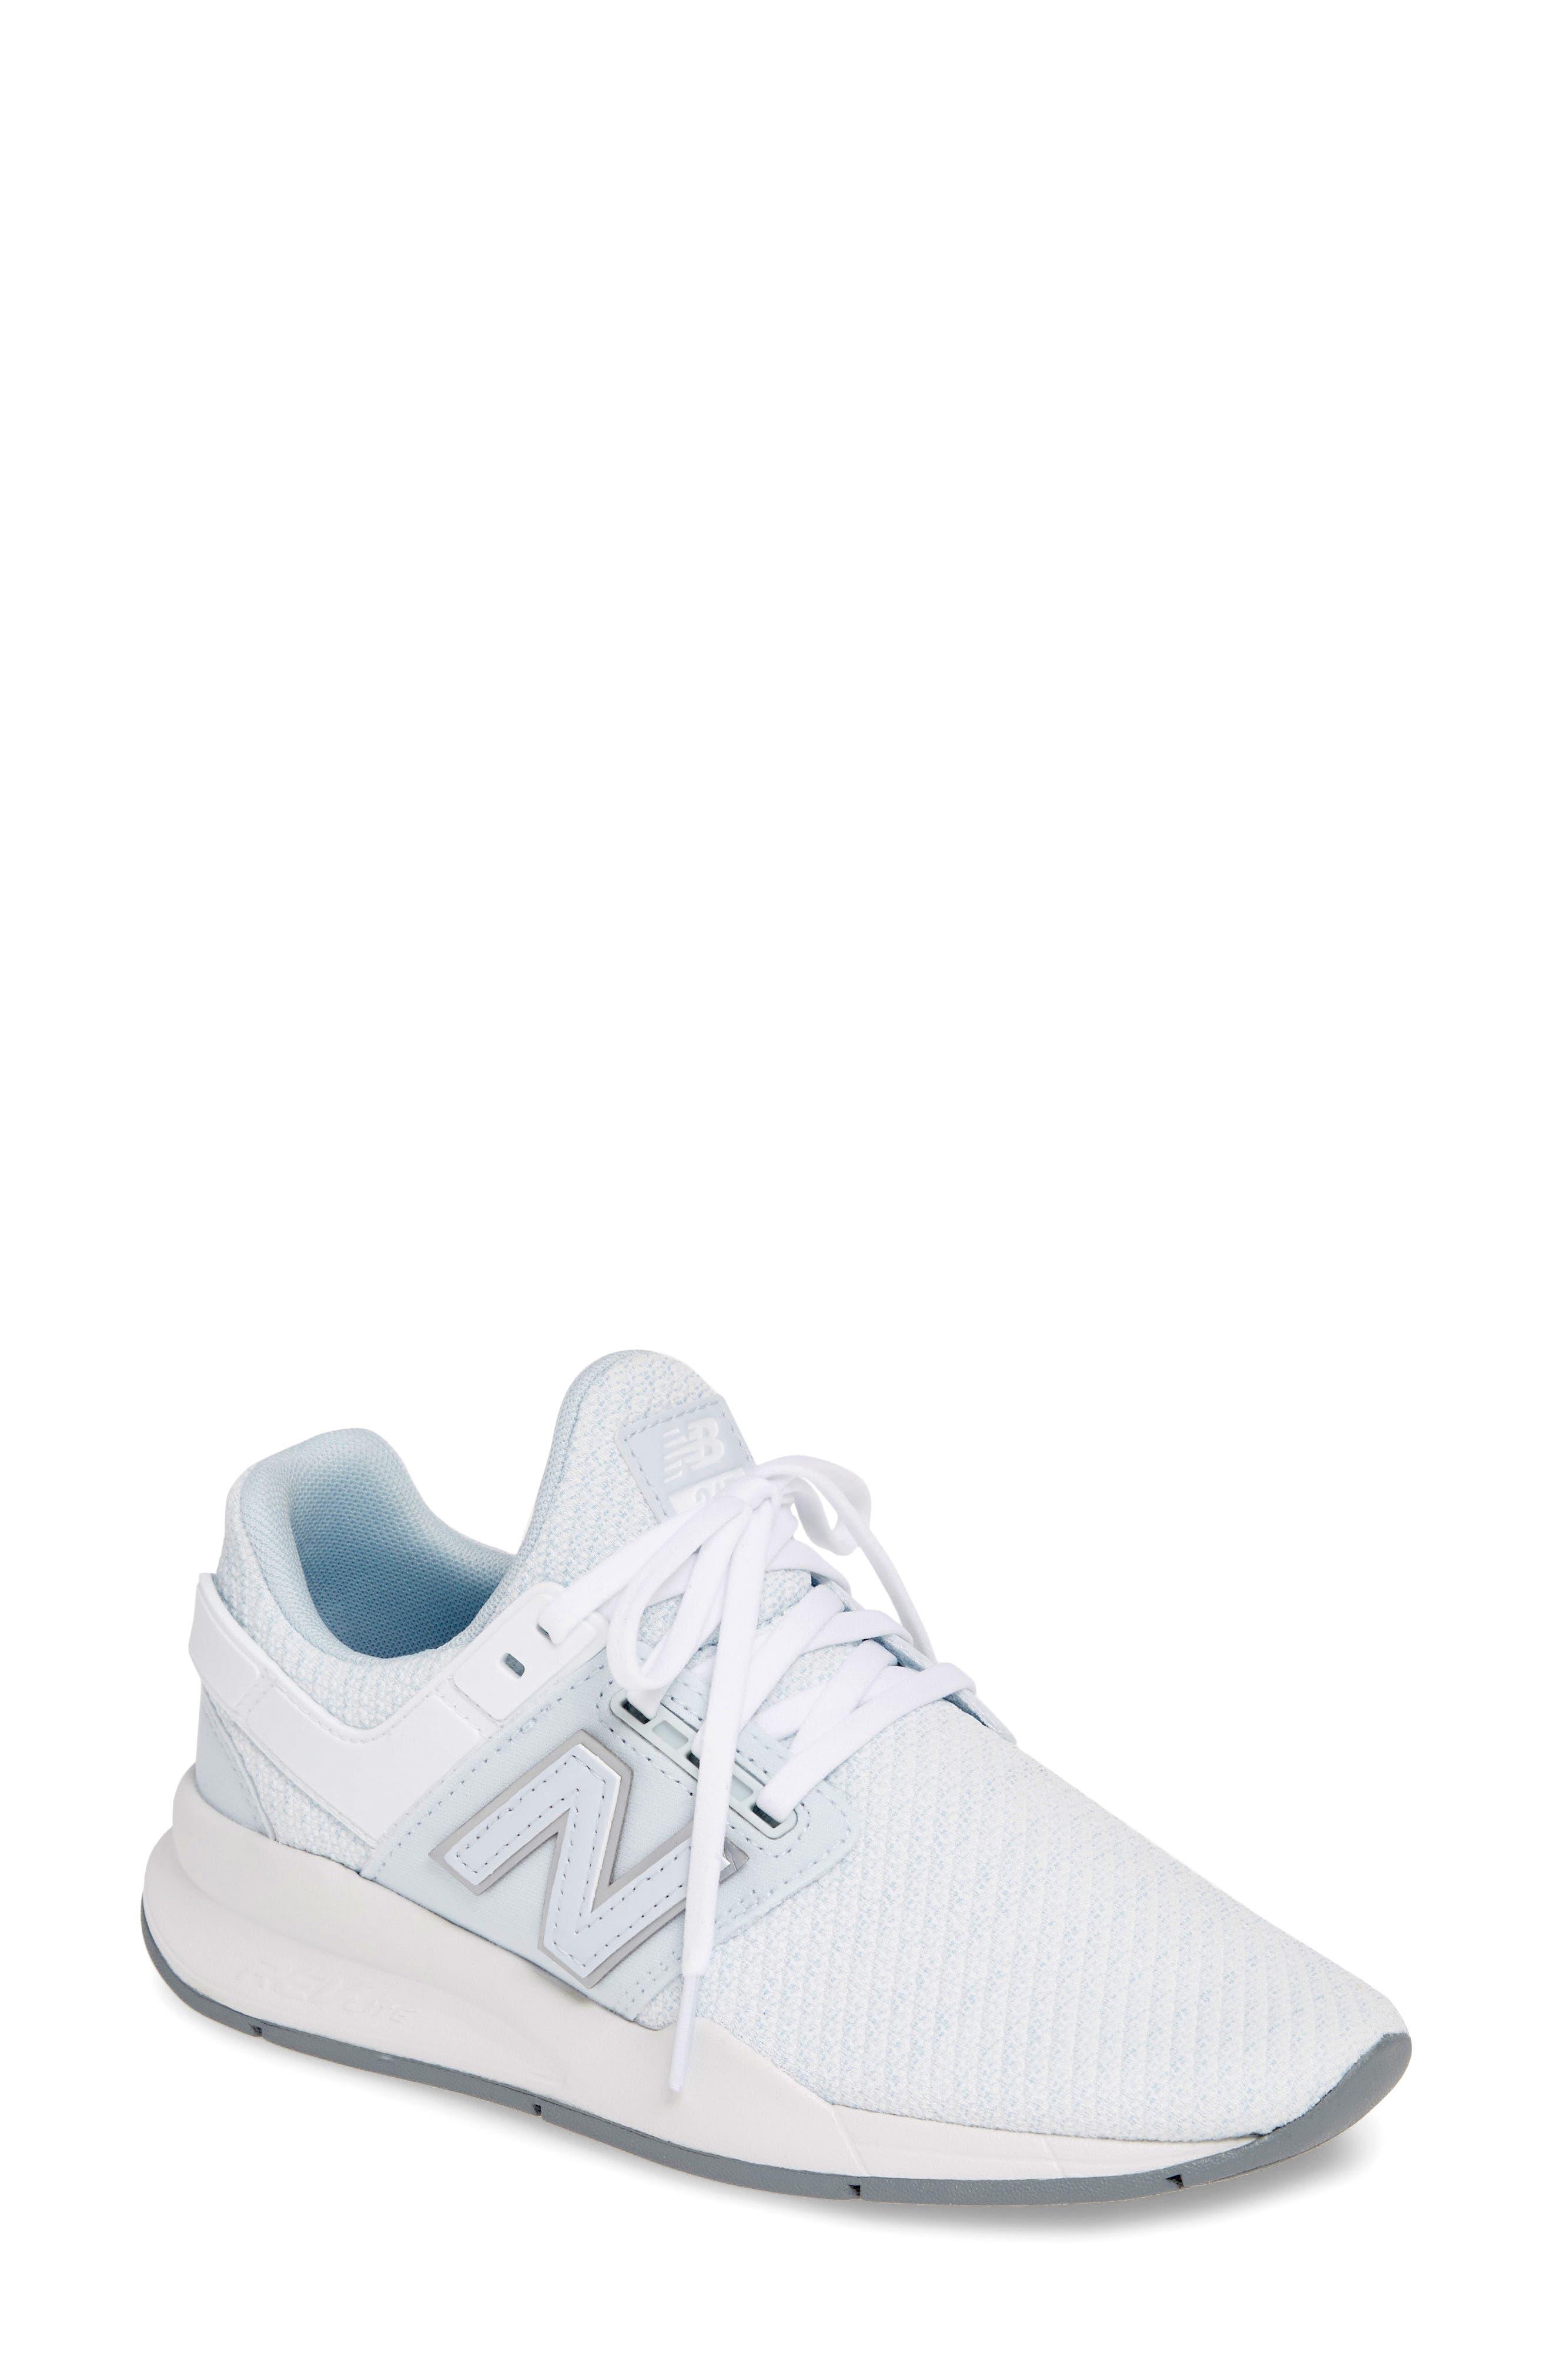 New Balance 247 Sneaker B - Grey